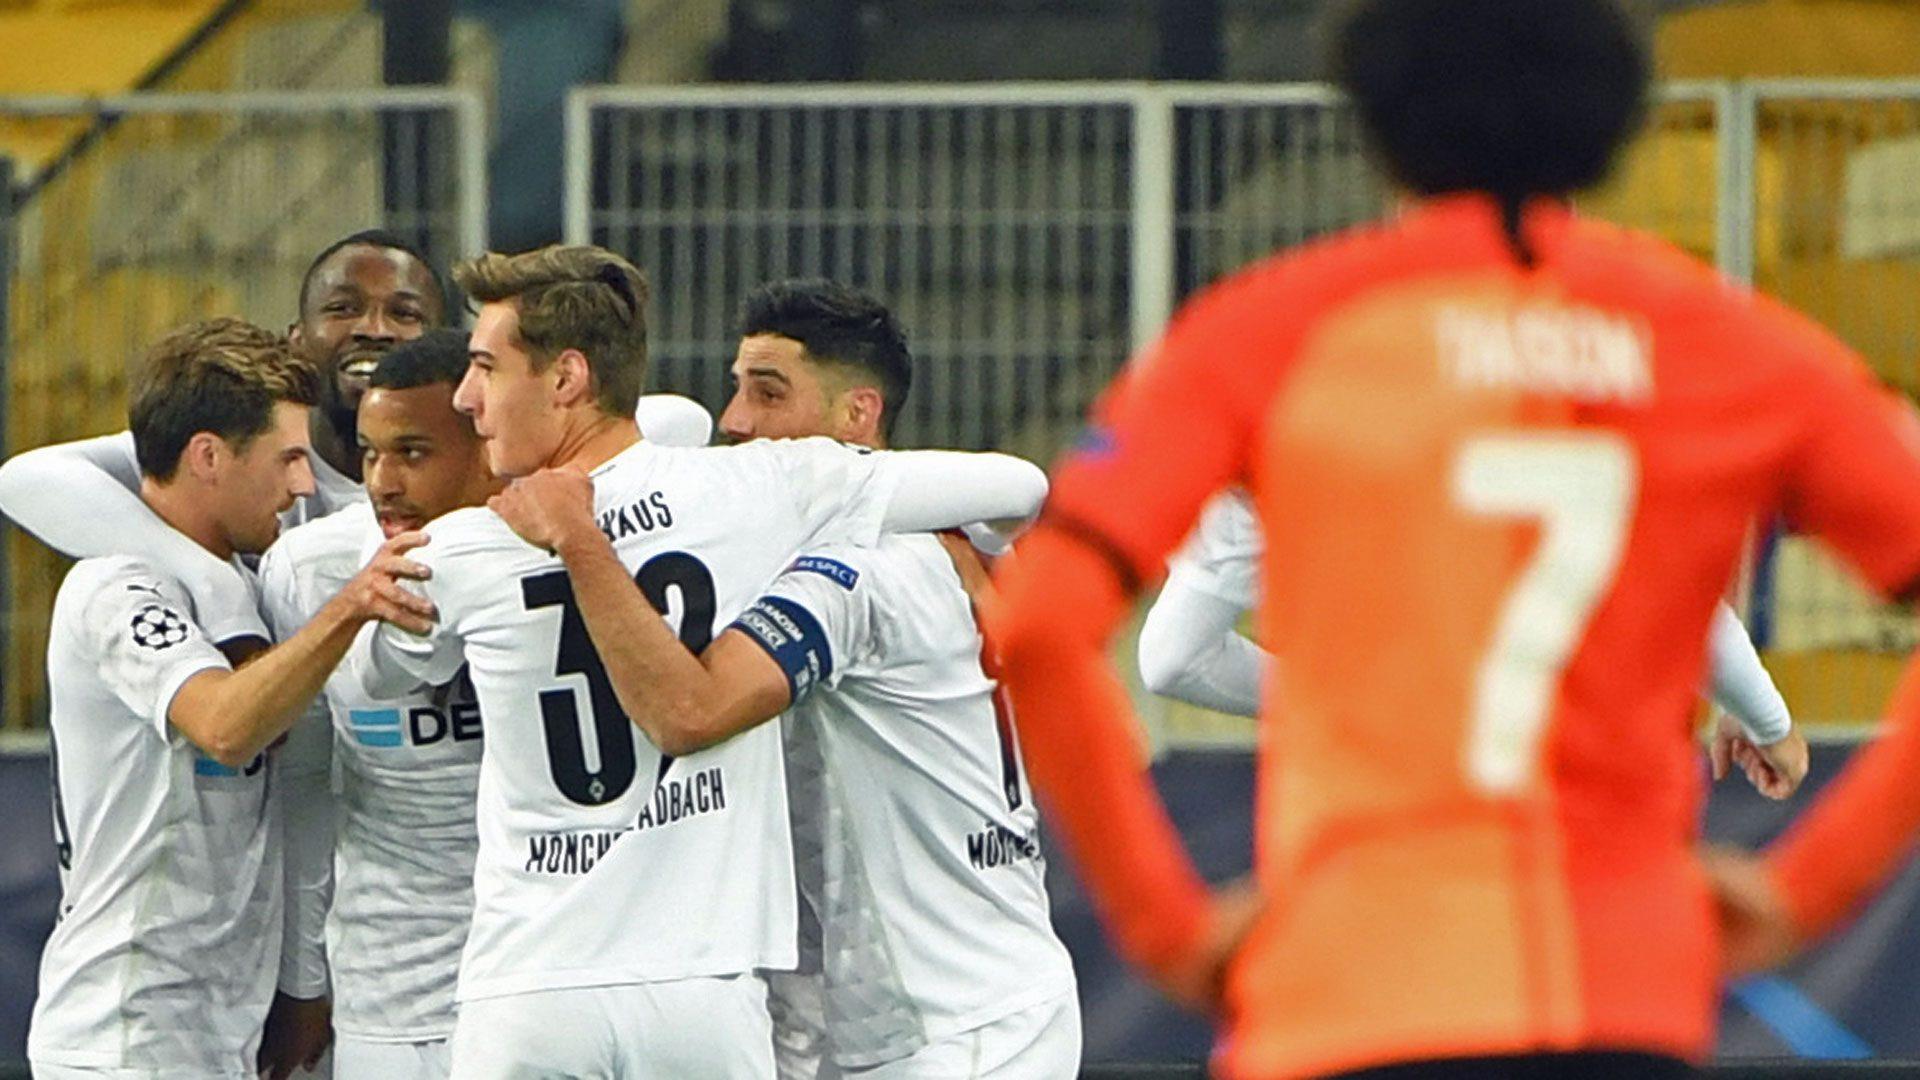 Bundesliga Alassane Plea Hits Hat Trick In Borussia Monchengladbach S 6 0 Rout Of Shakhtar Donetsk